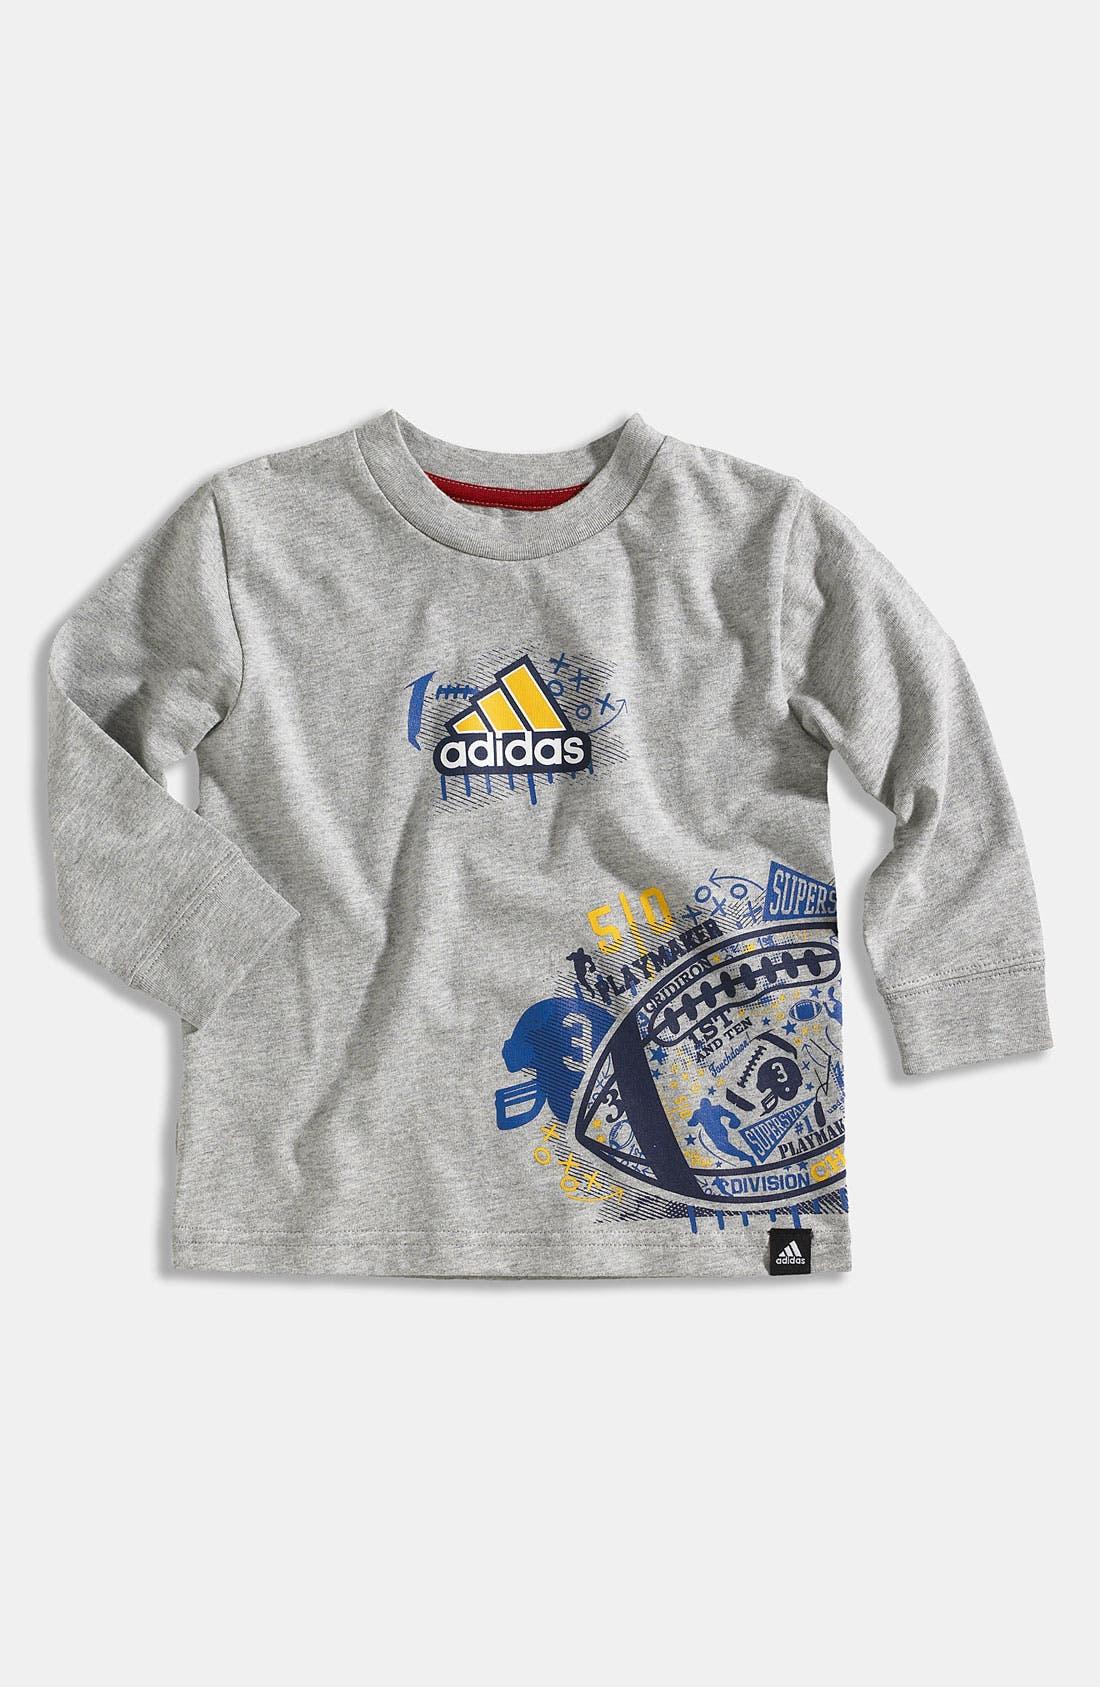 Main Image - adidas 'Playbook Wrap' T-Shirt (Infant)